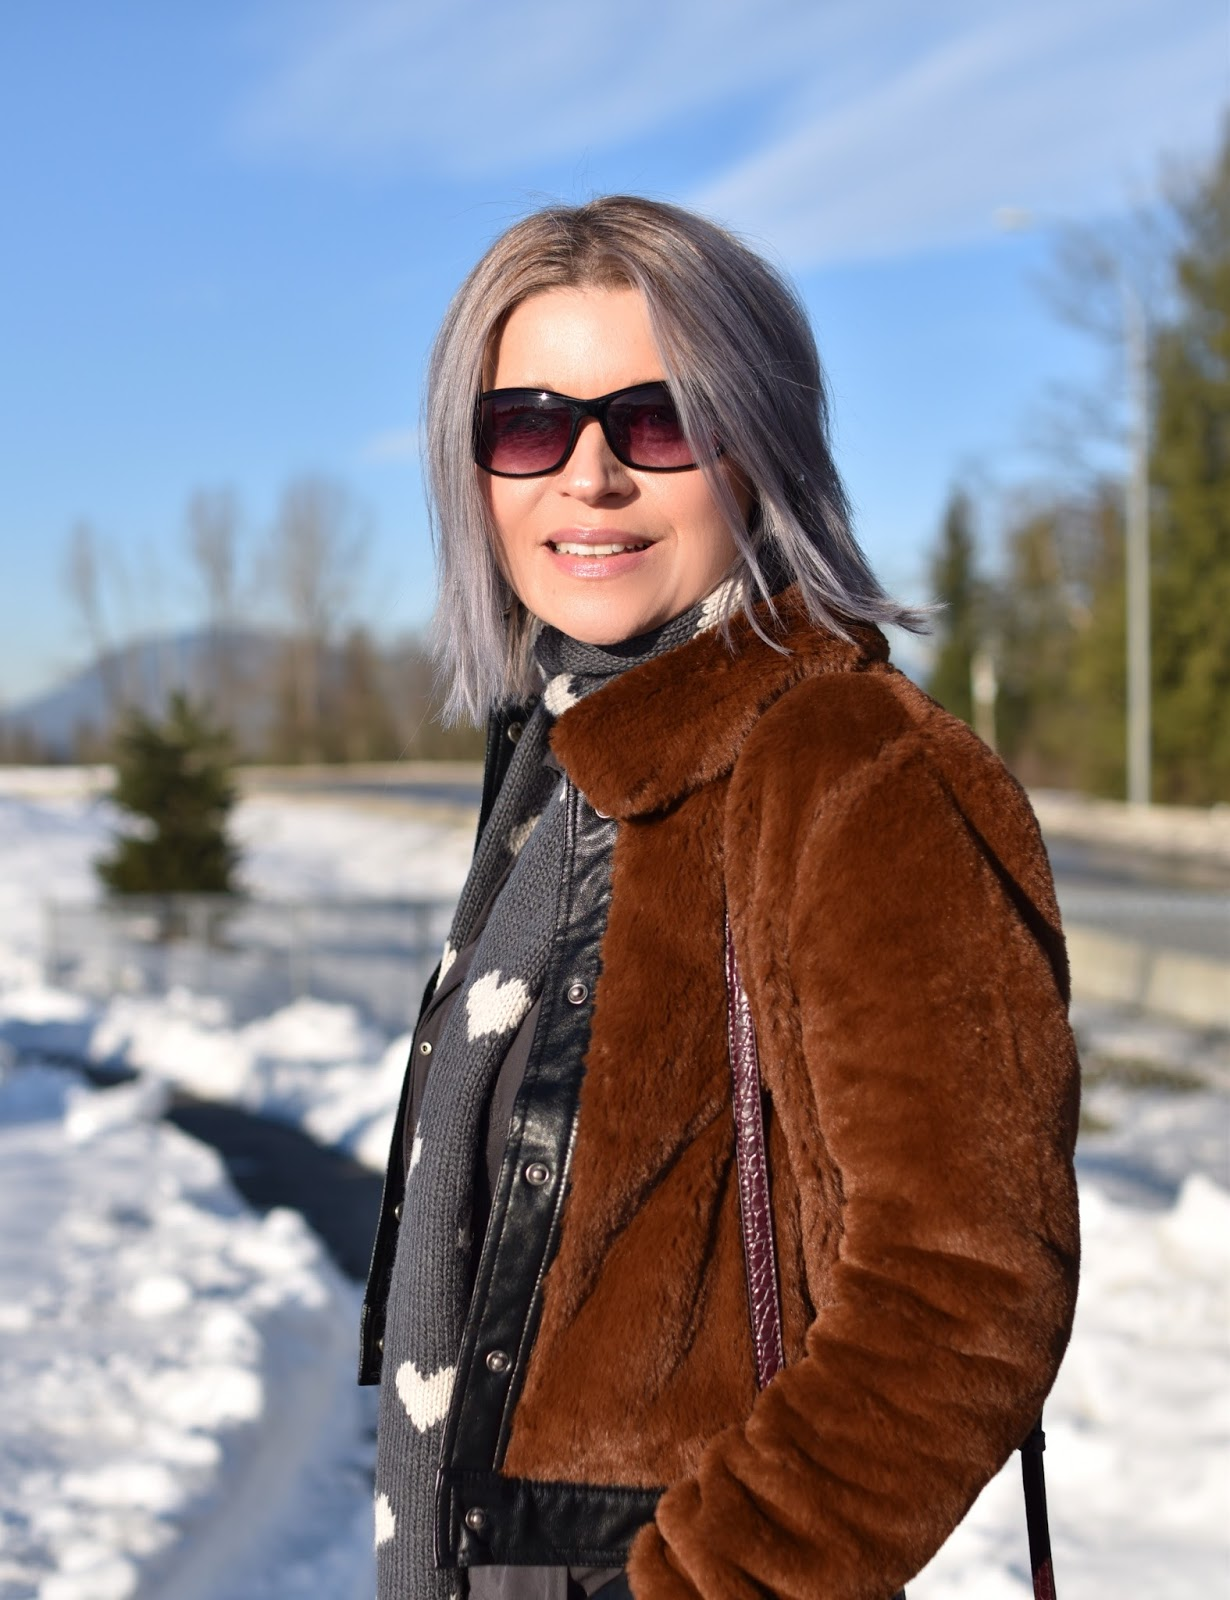 Monika Faulkner outfit inspiration - teddybear bomber jacket, heart-embellished scarf, sunglasses